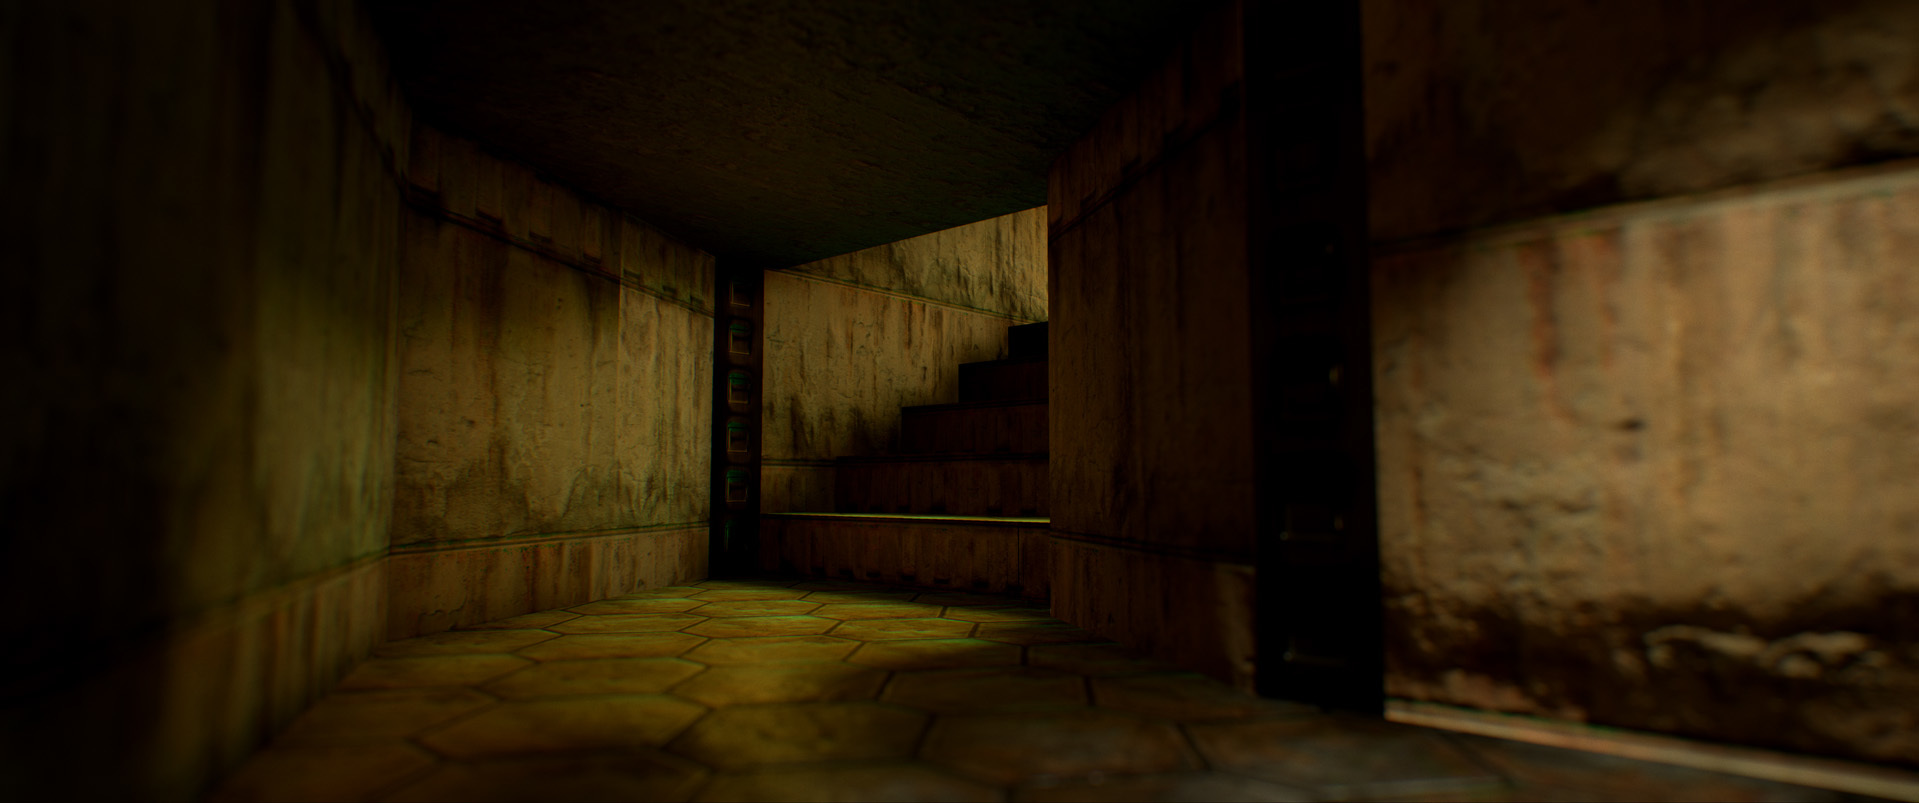 Foto de Nivel E1M1 de Doom en Unreal Engine (7/13)